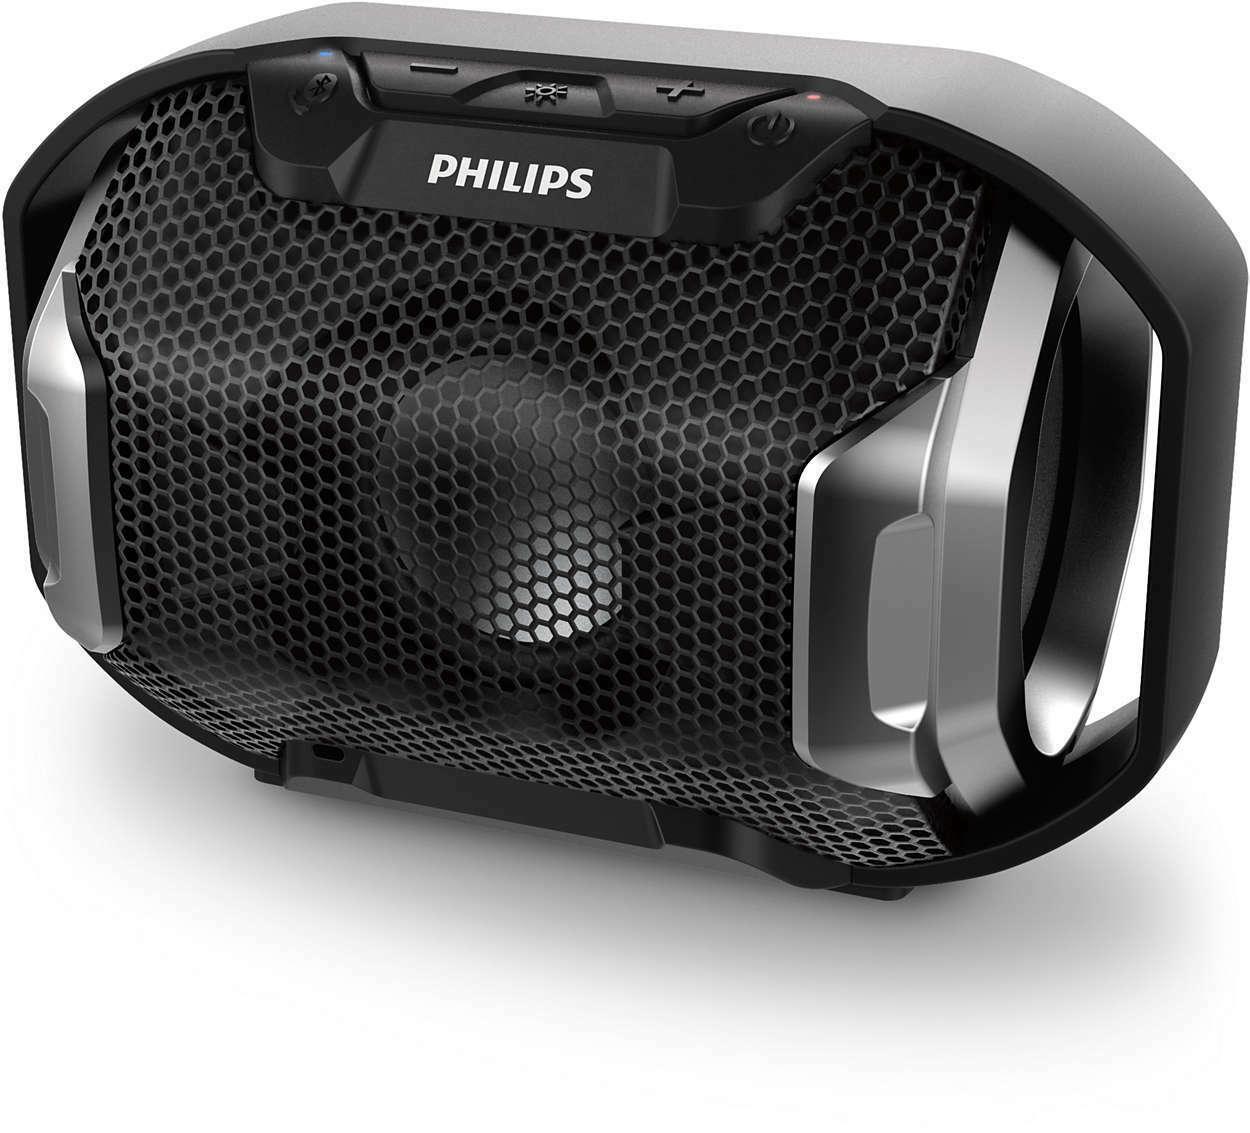 d2b677b3d646e1 Details about Philips ShoqBox SB300B Waterproof IPX7 Bluetooth Speaker w/  Multi-Colored Lights